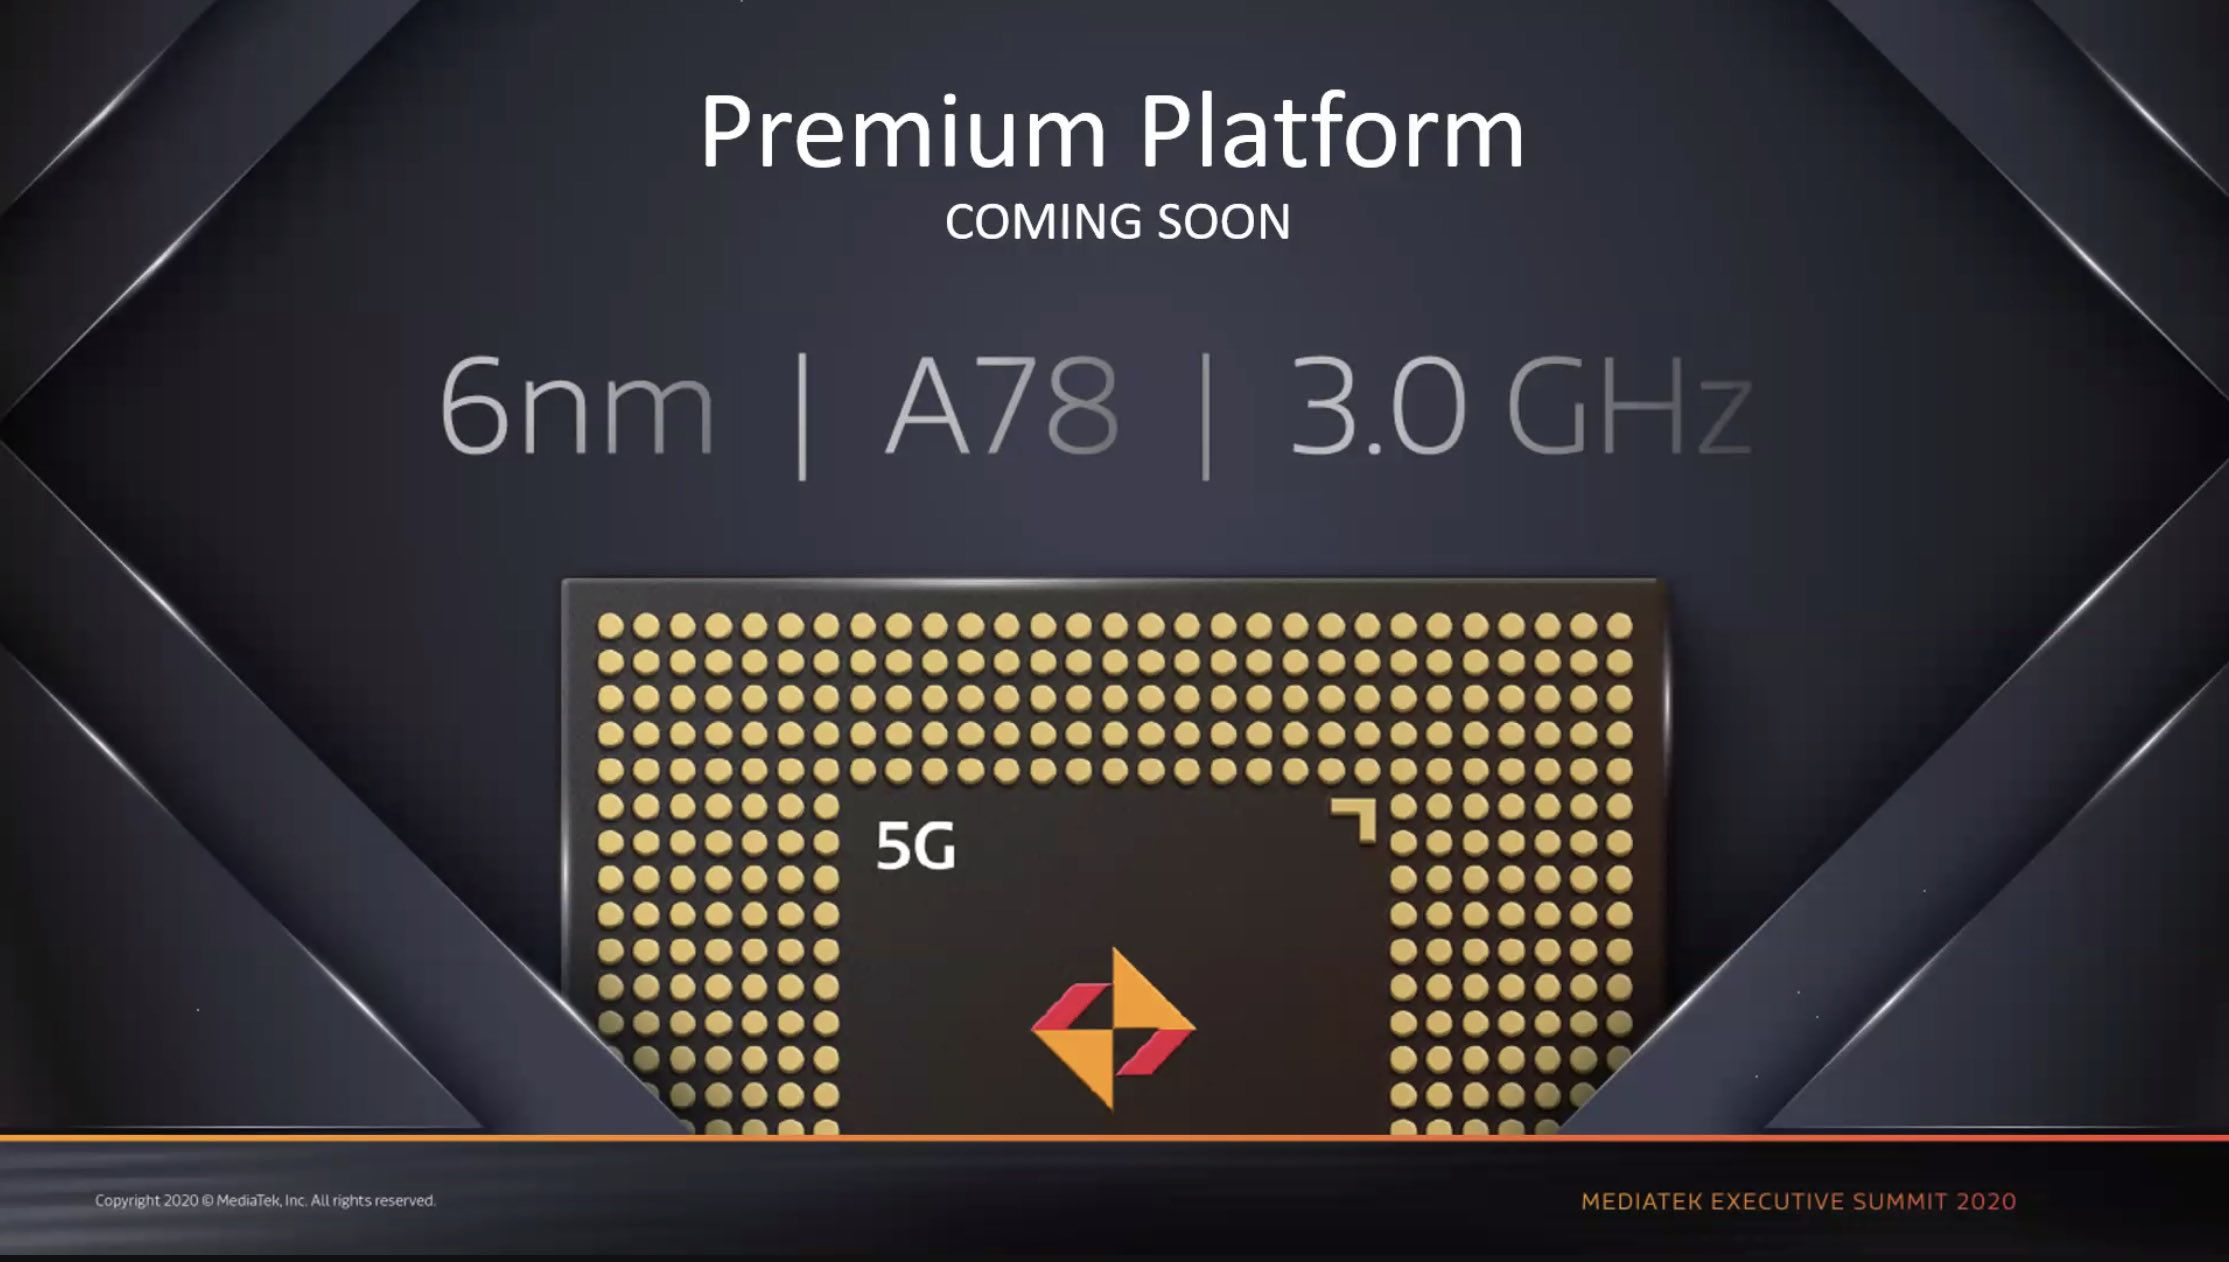 MediaTekが6nm EUV製造プロセス+A78(3.0GHz)を採用した製品の発表を予告